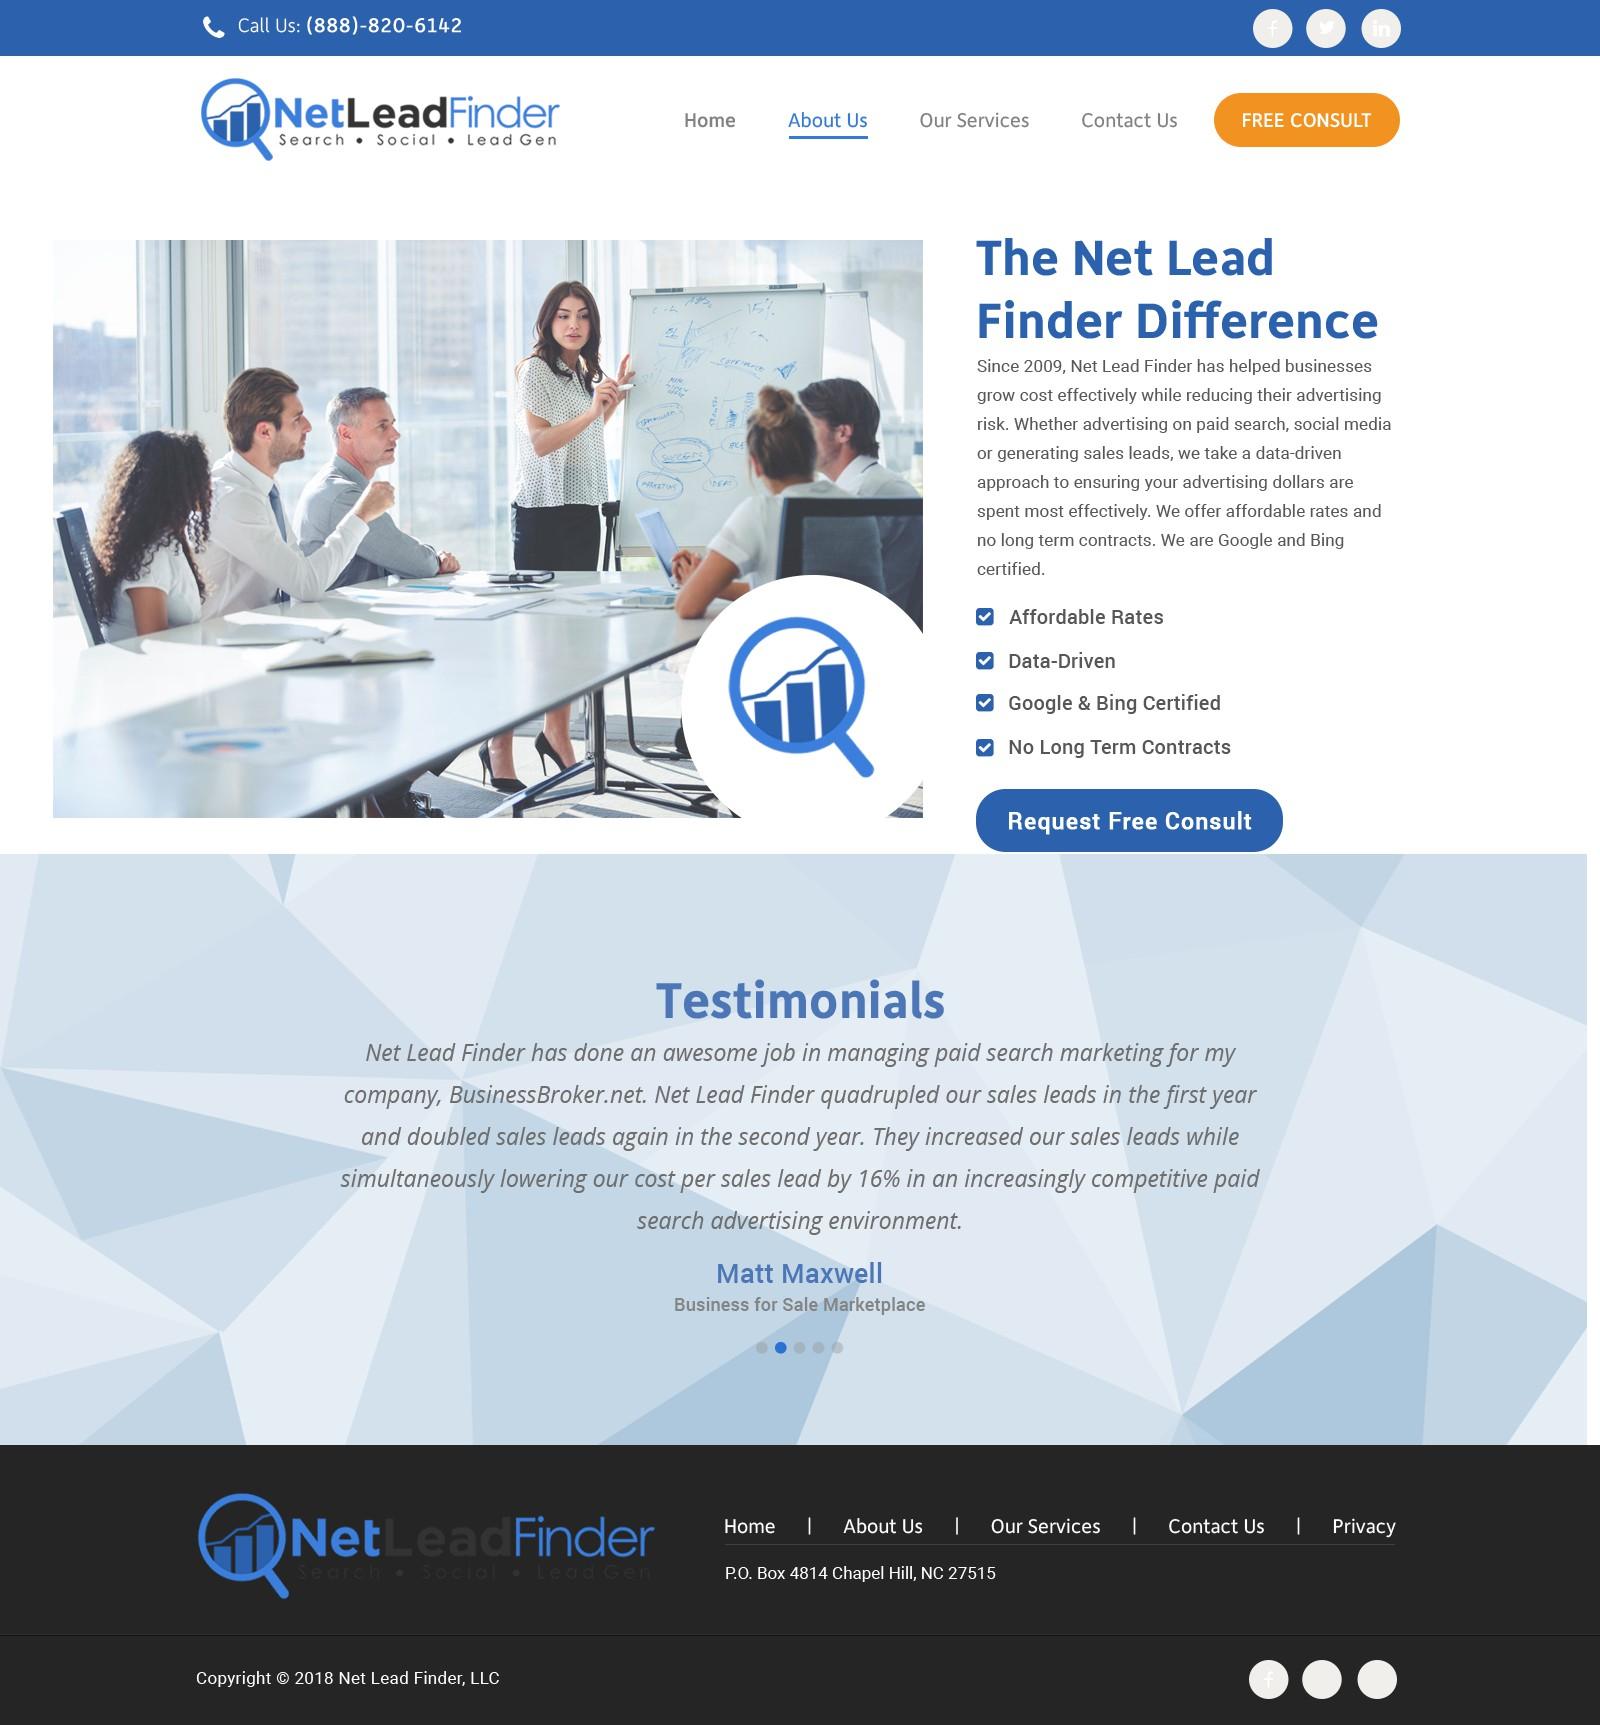 Create a New Website Design for Internet Marketing Company